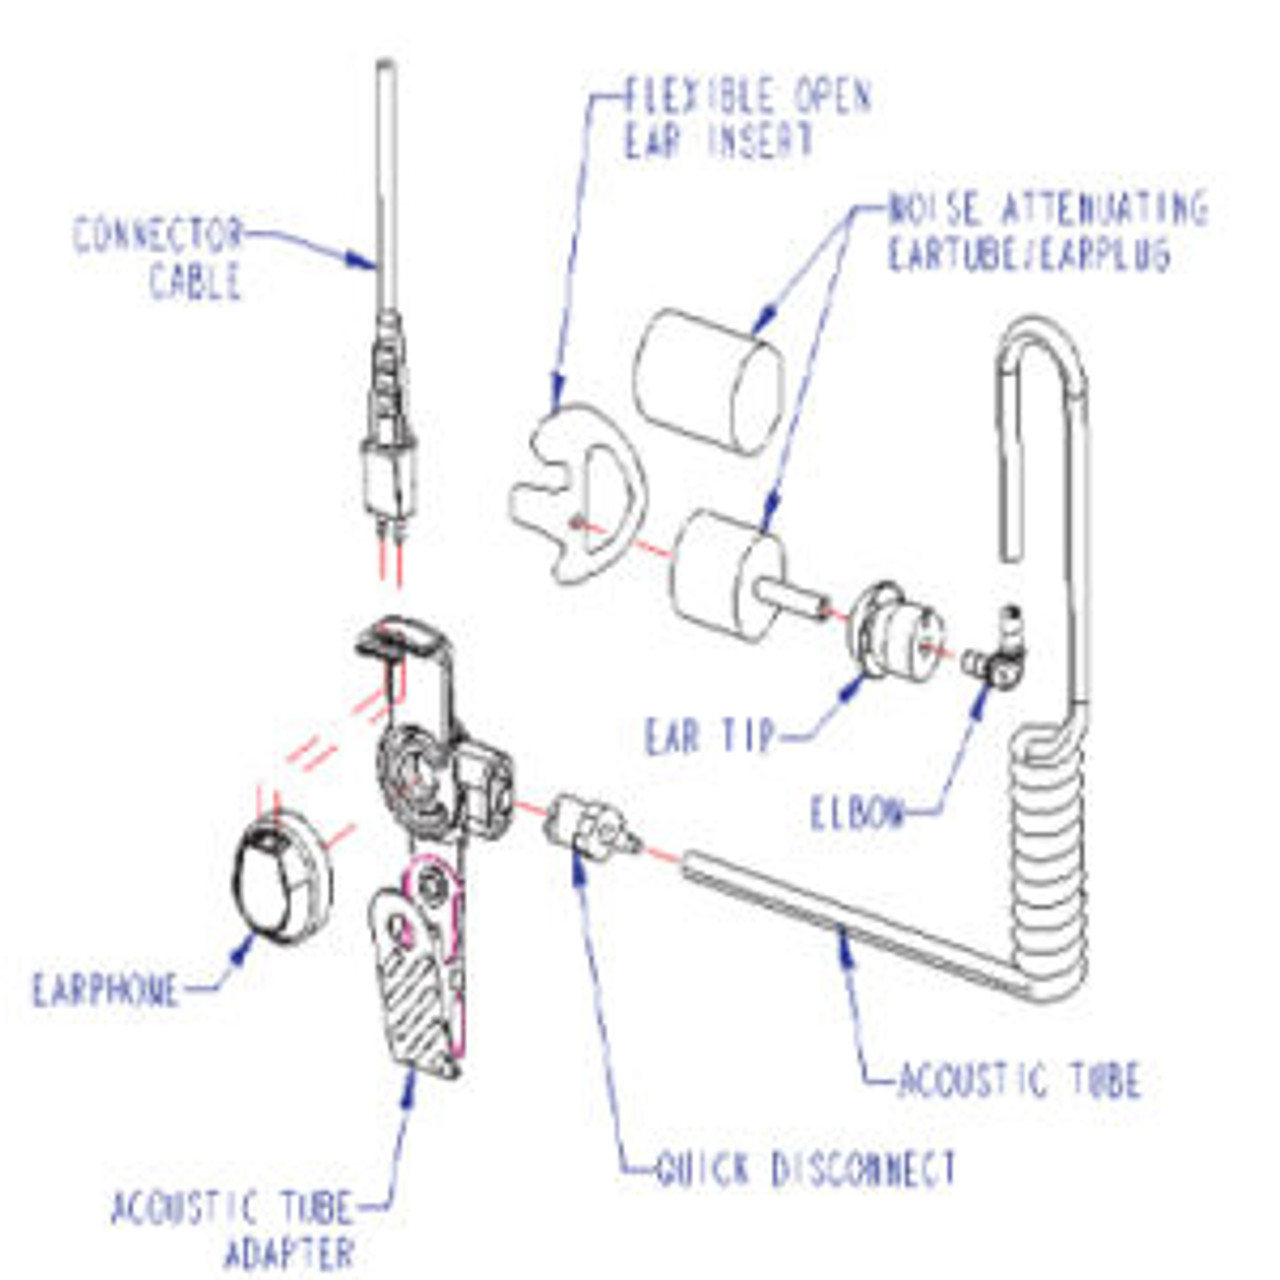 GE / Ericsson 700P Heavy Duty Two Wire Surveillance Kit